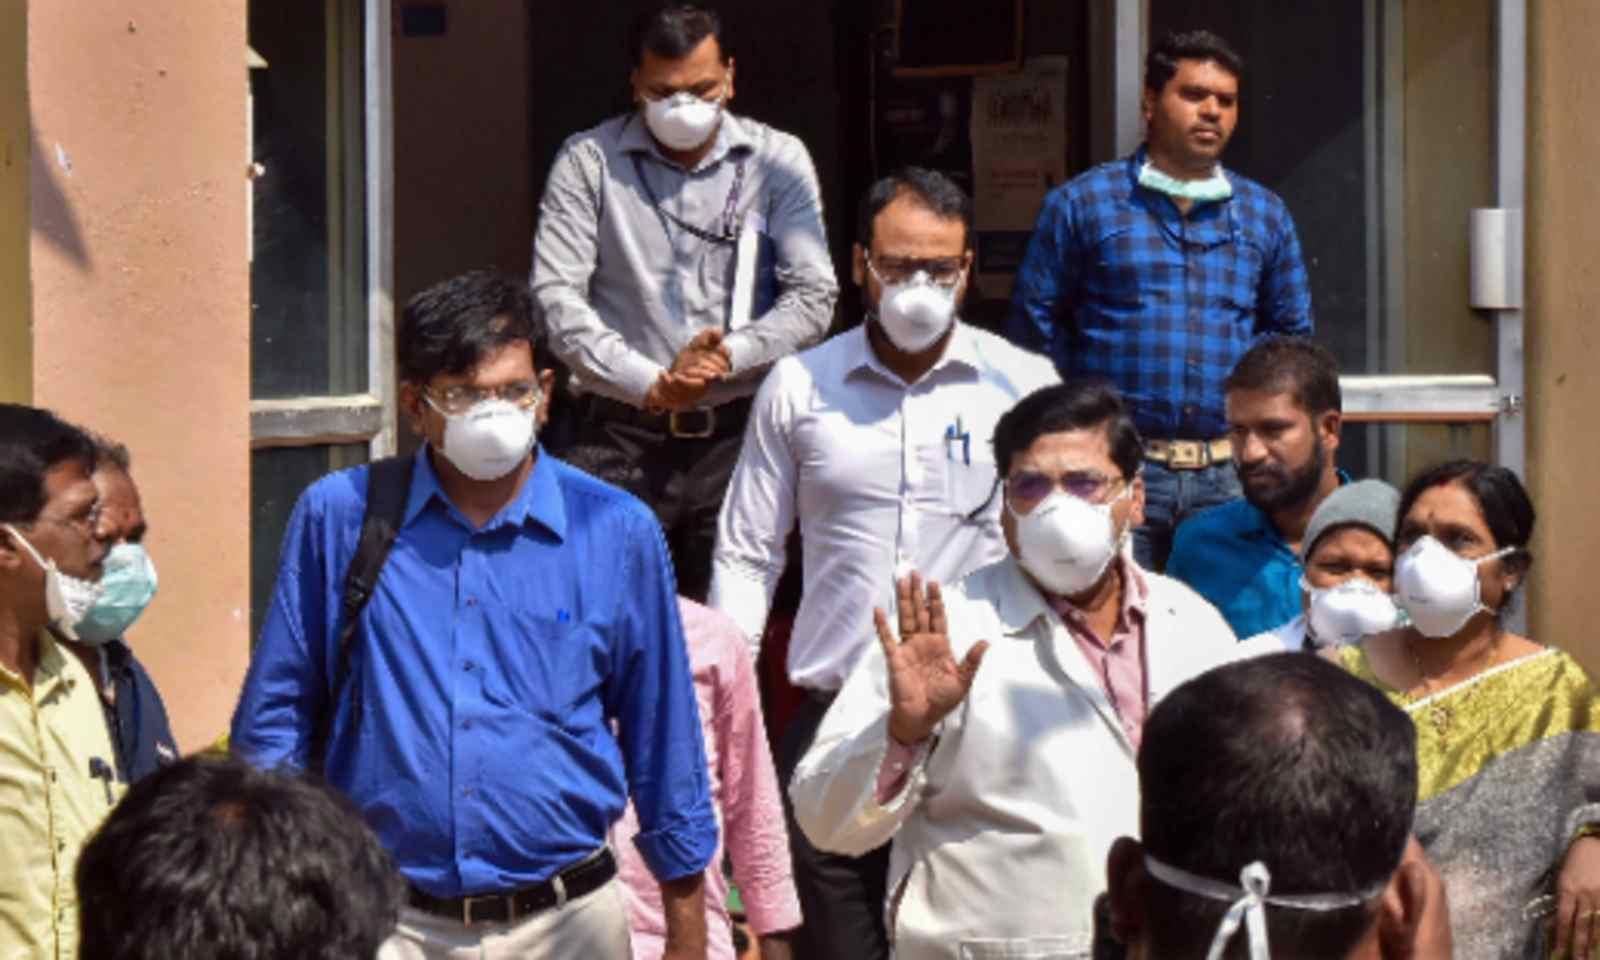 Coronavirus outbreak: Preparations for evacuating Indians from Hubei has begun, says MEA